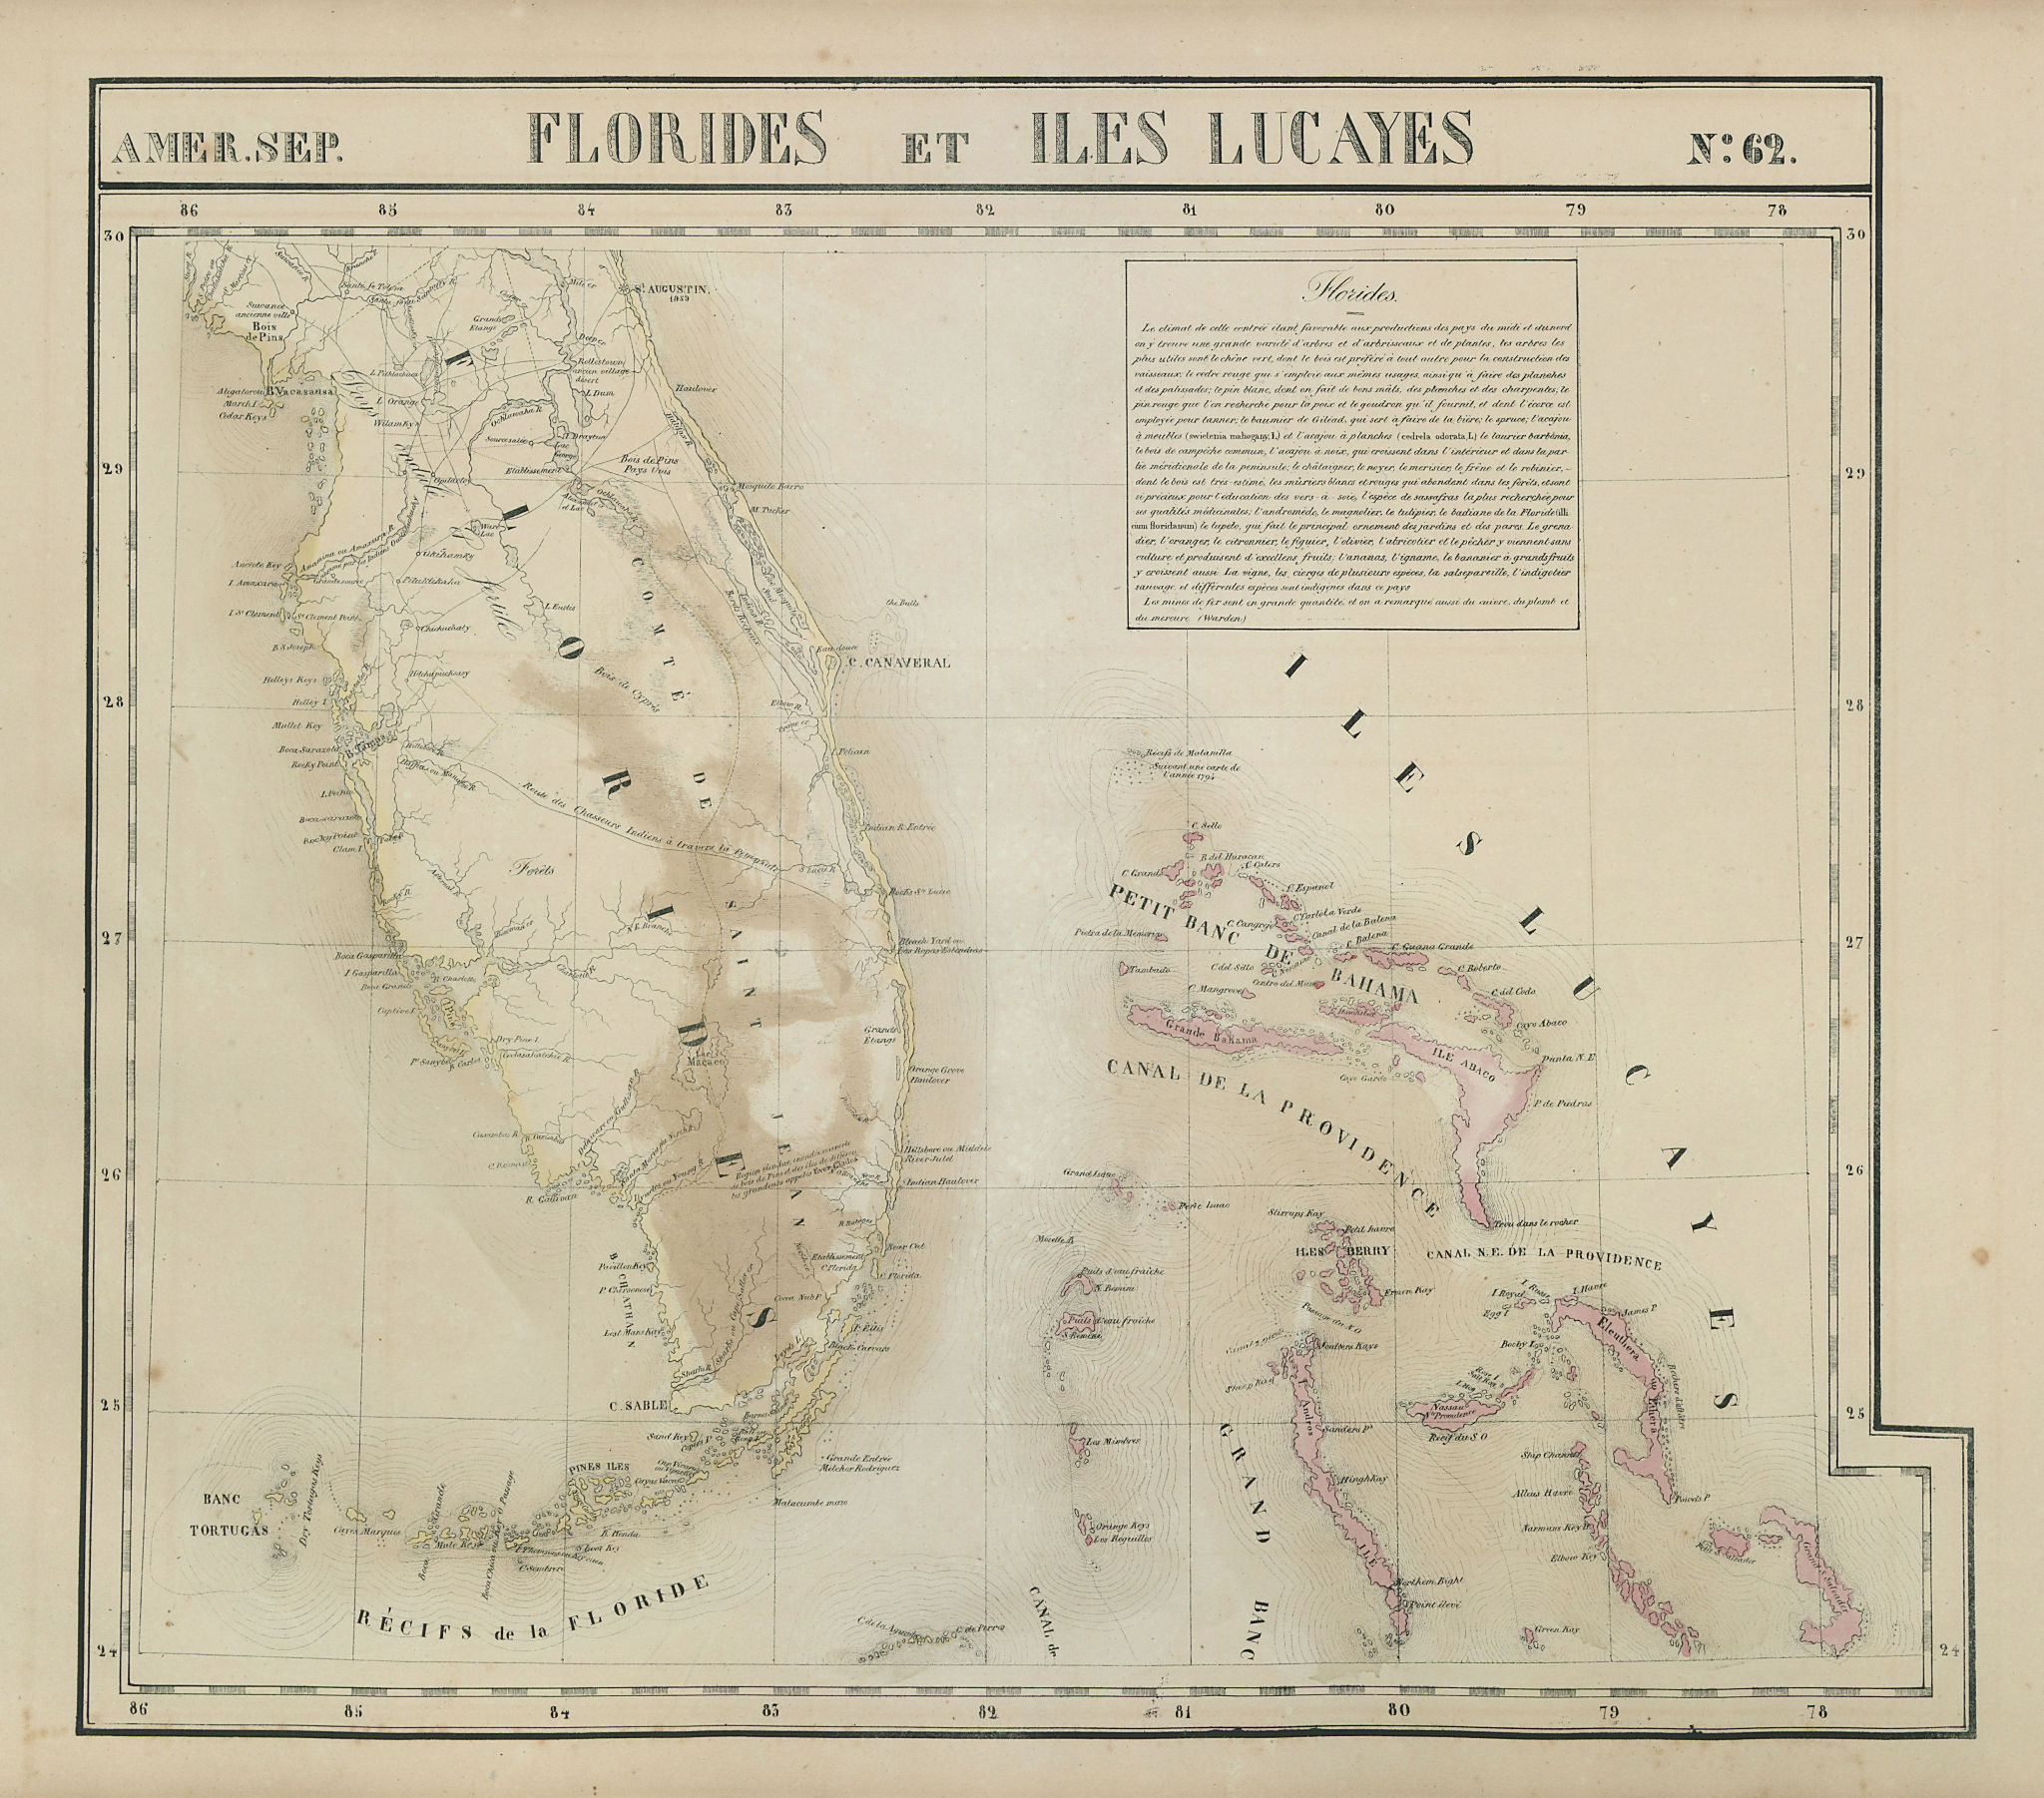 Amér. Sep. Florides et Iles Lucayes #62 Florida & Bahamas. VANDERMAELEN 1827 map